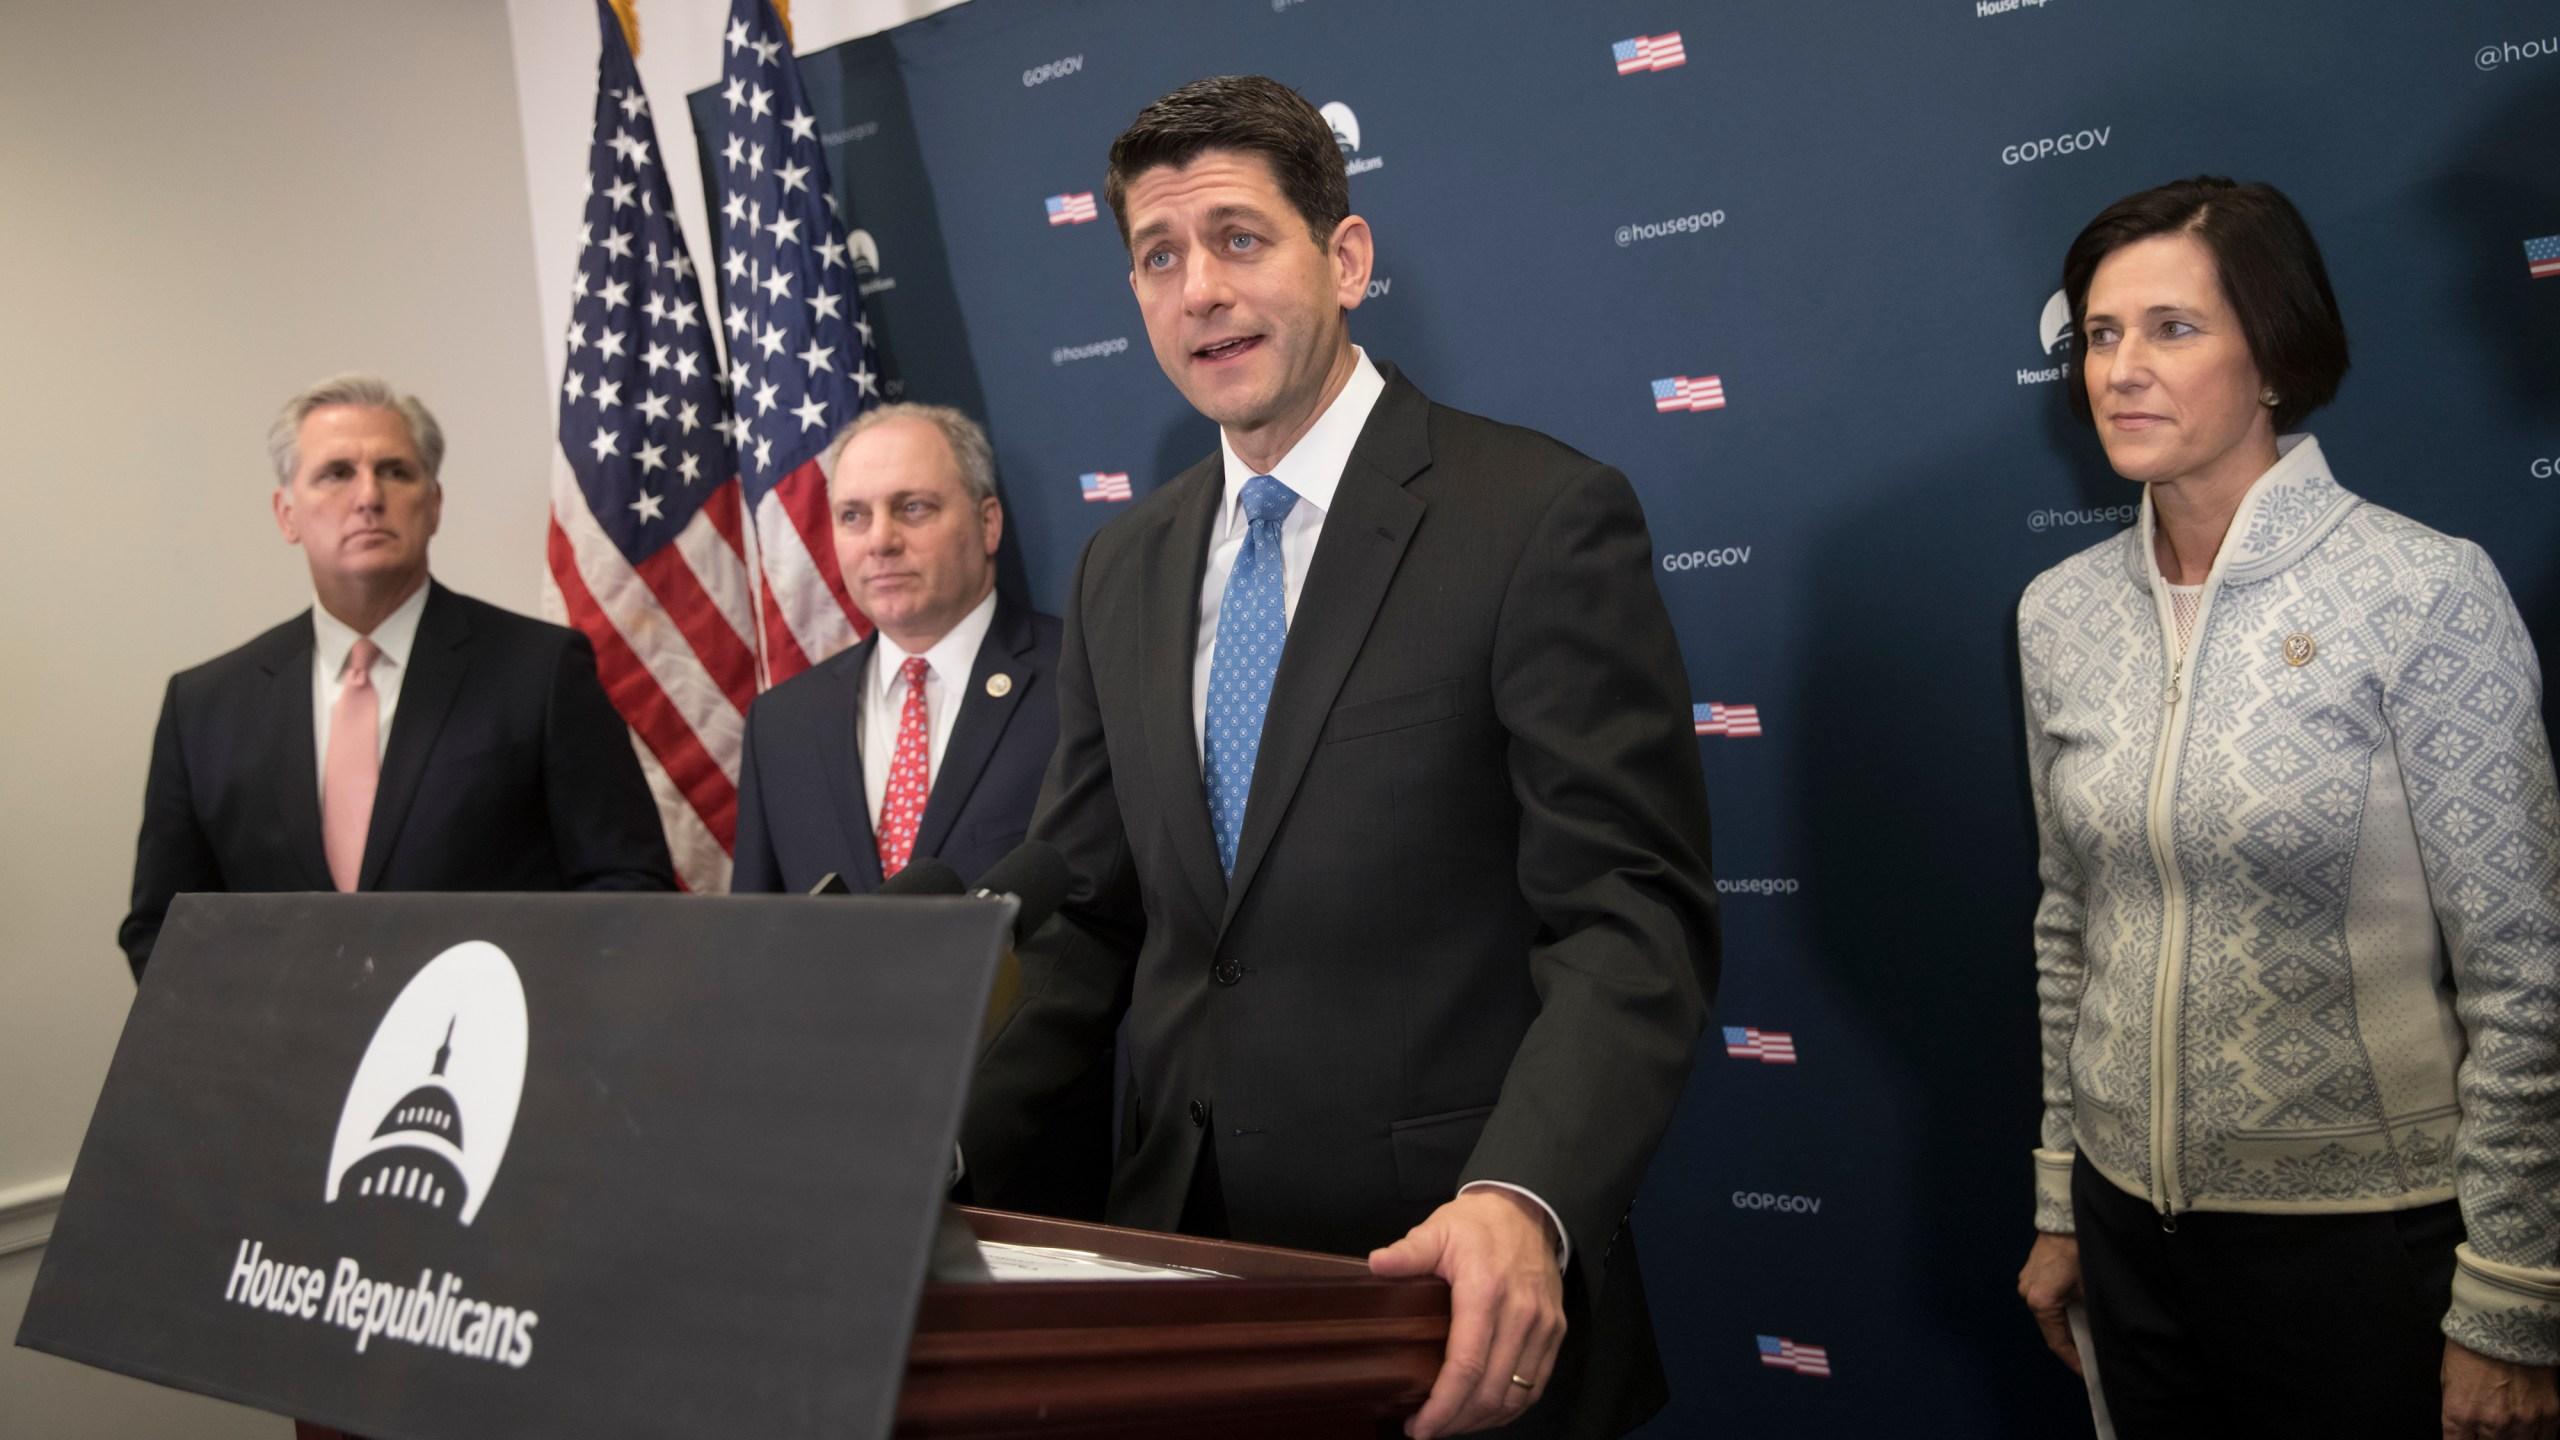 Paul Ryan, Kevin McCarthy, Steve Scalise, Mimi Walters_513914